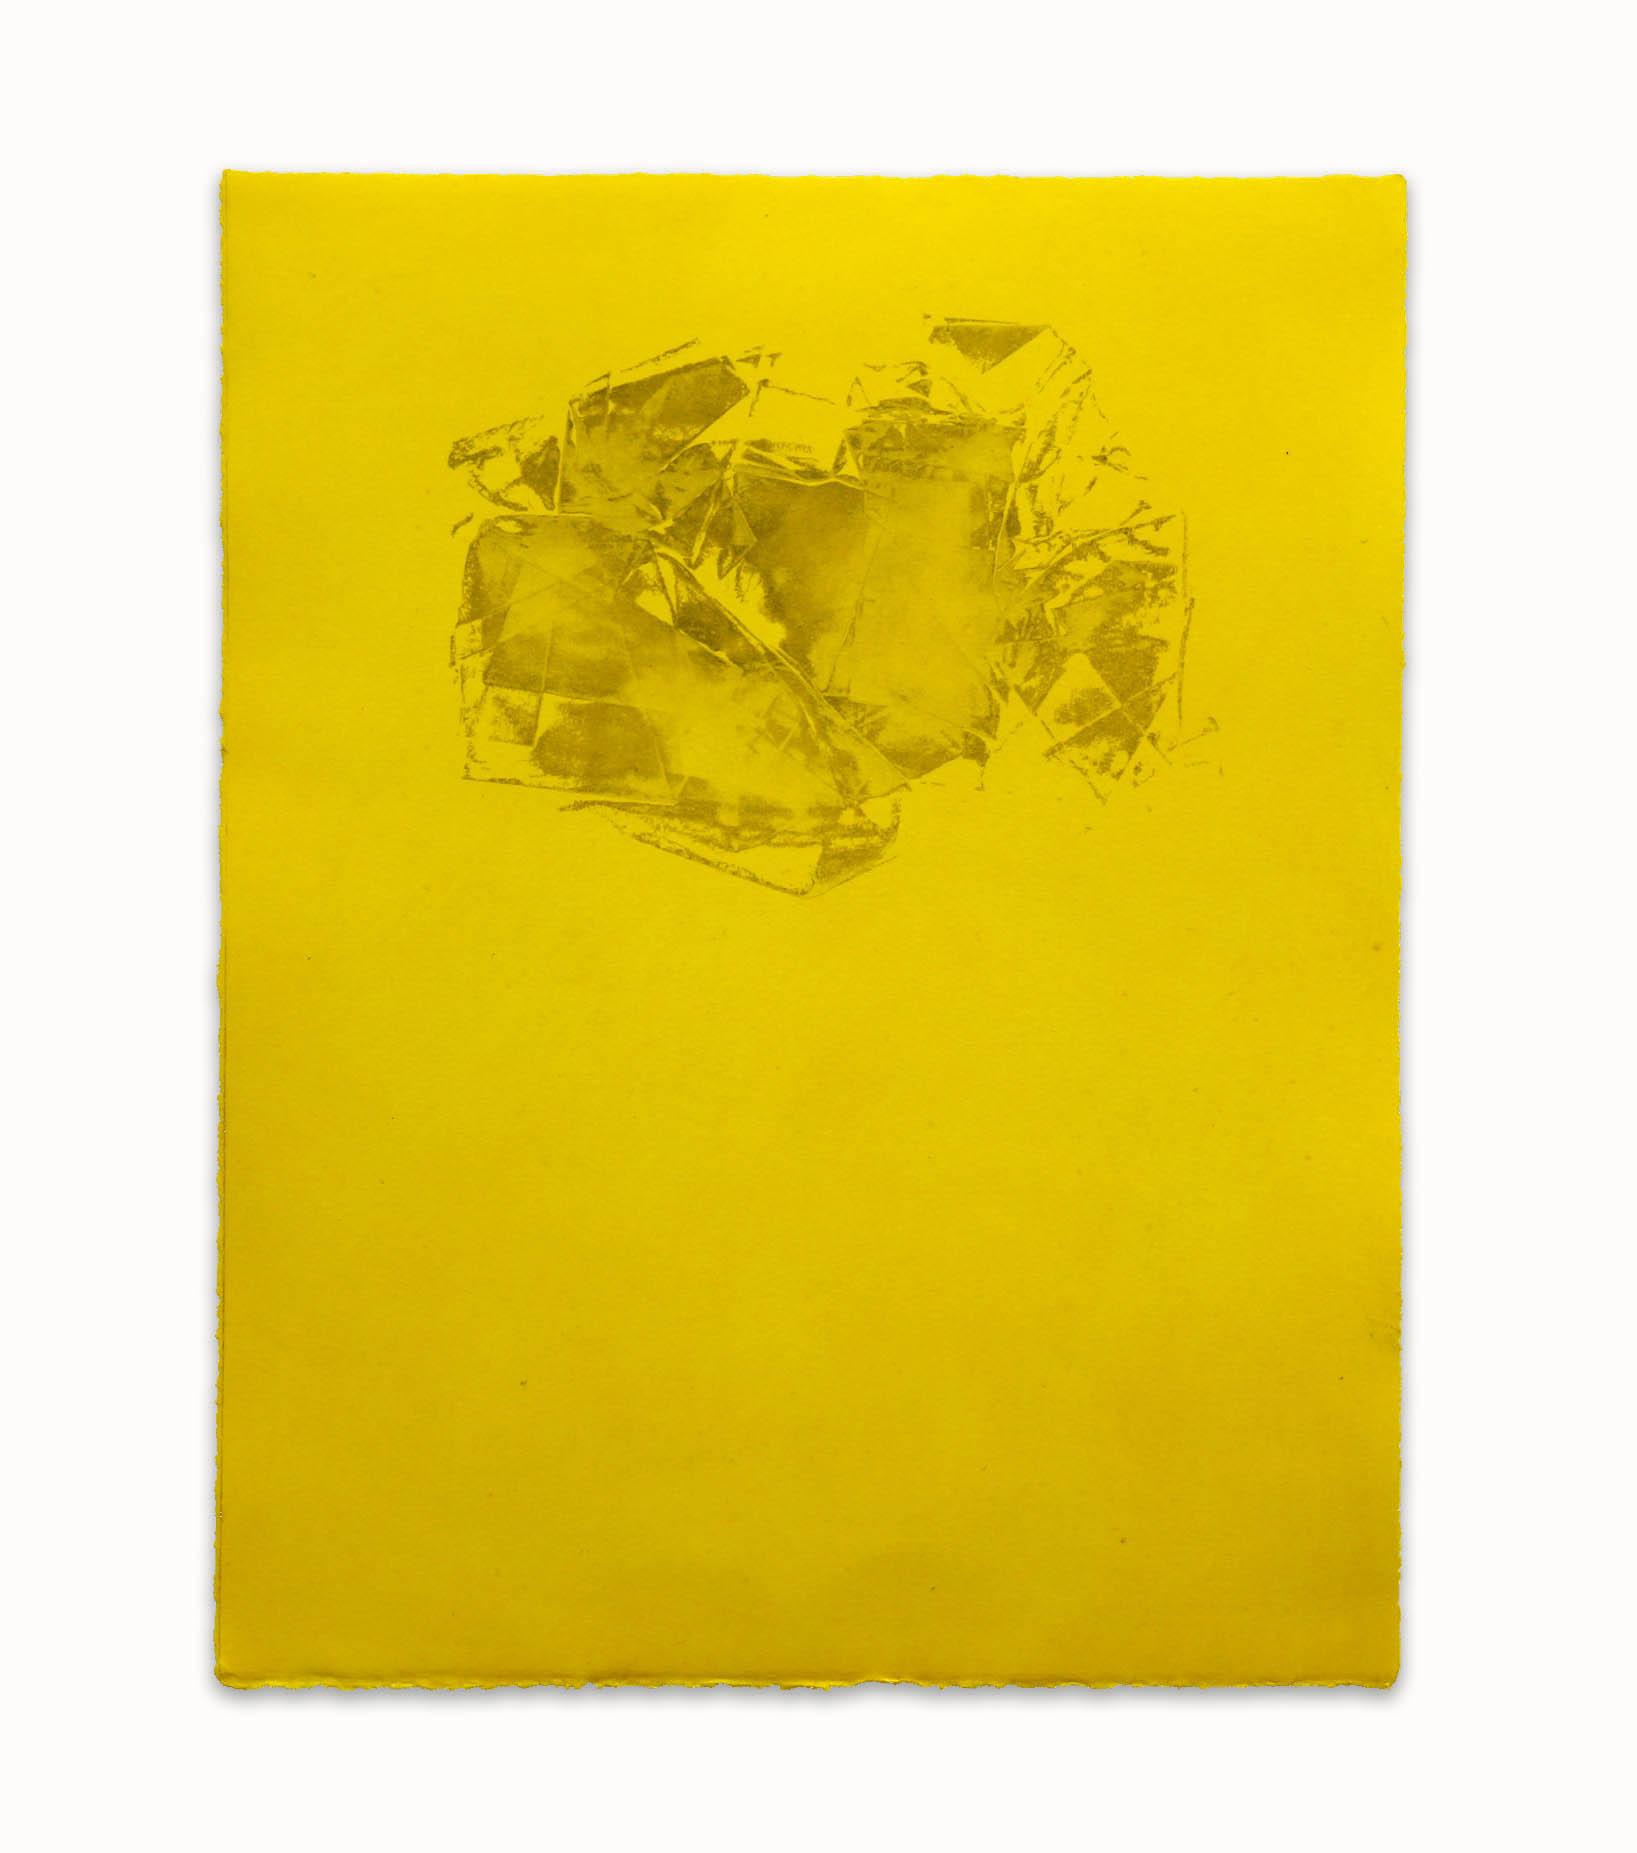 Inside Cadmium Yellow  - 2017  Incisione su carta E 1/4  48,3 x 37,6 cm